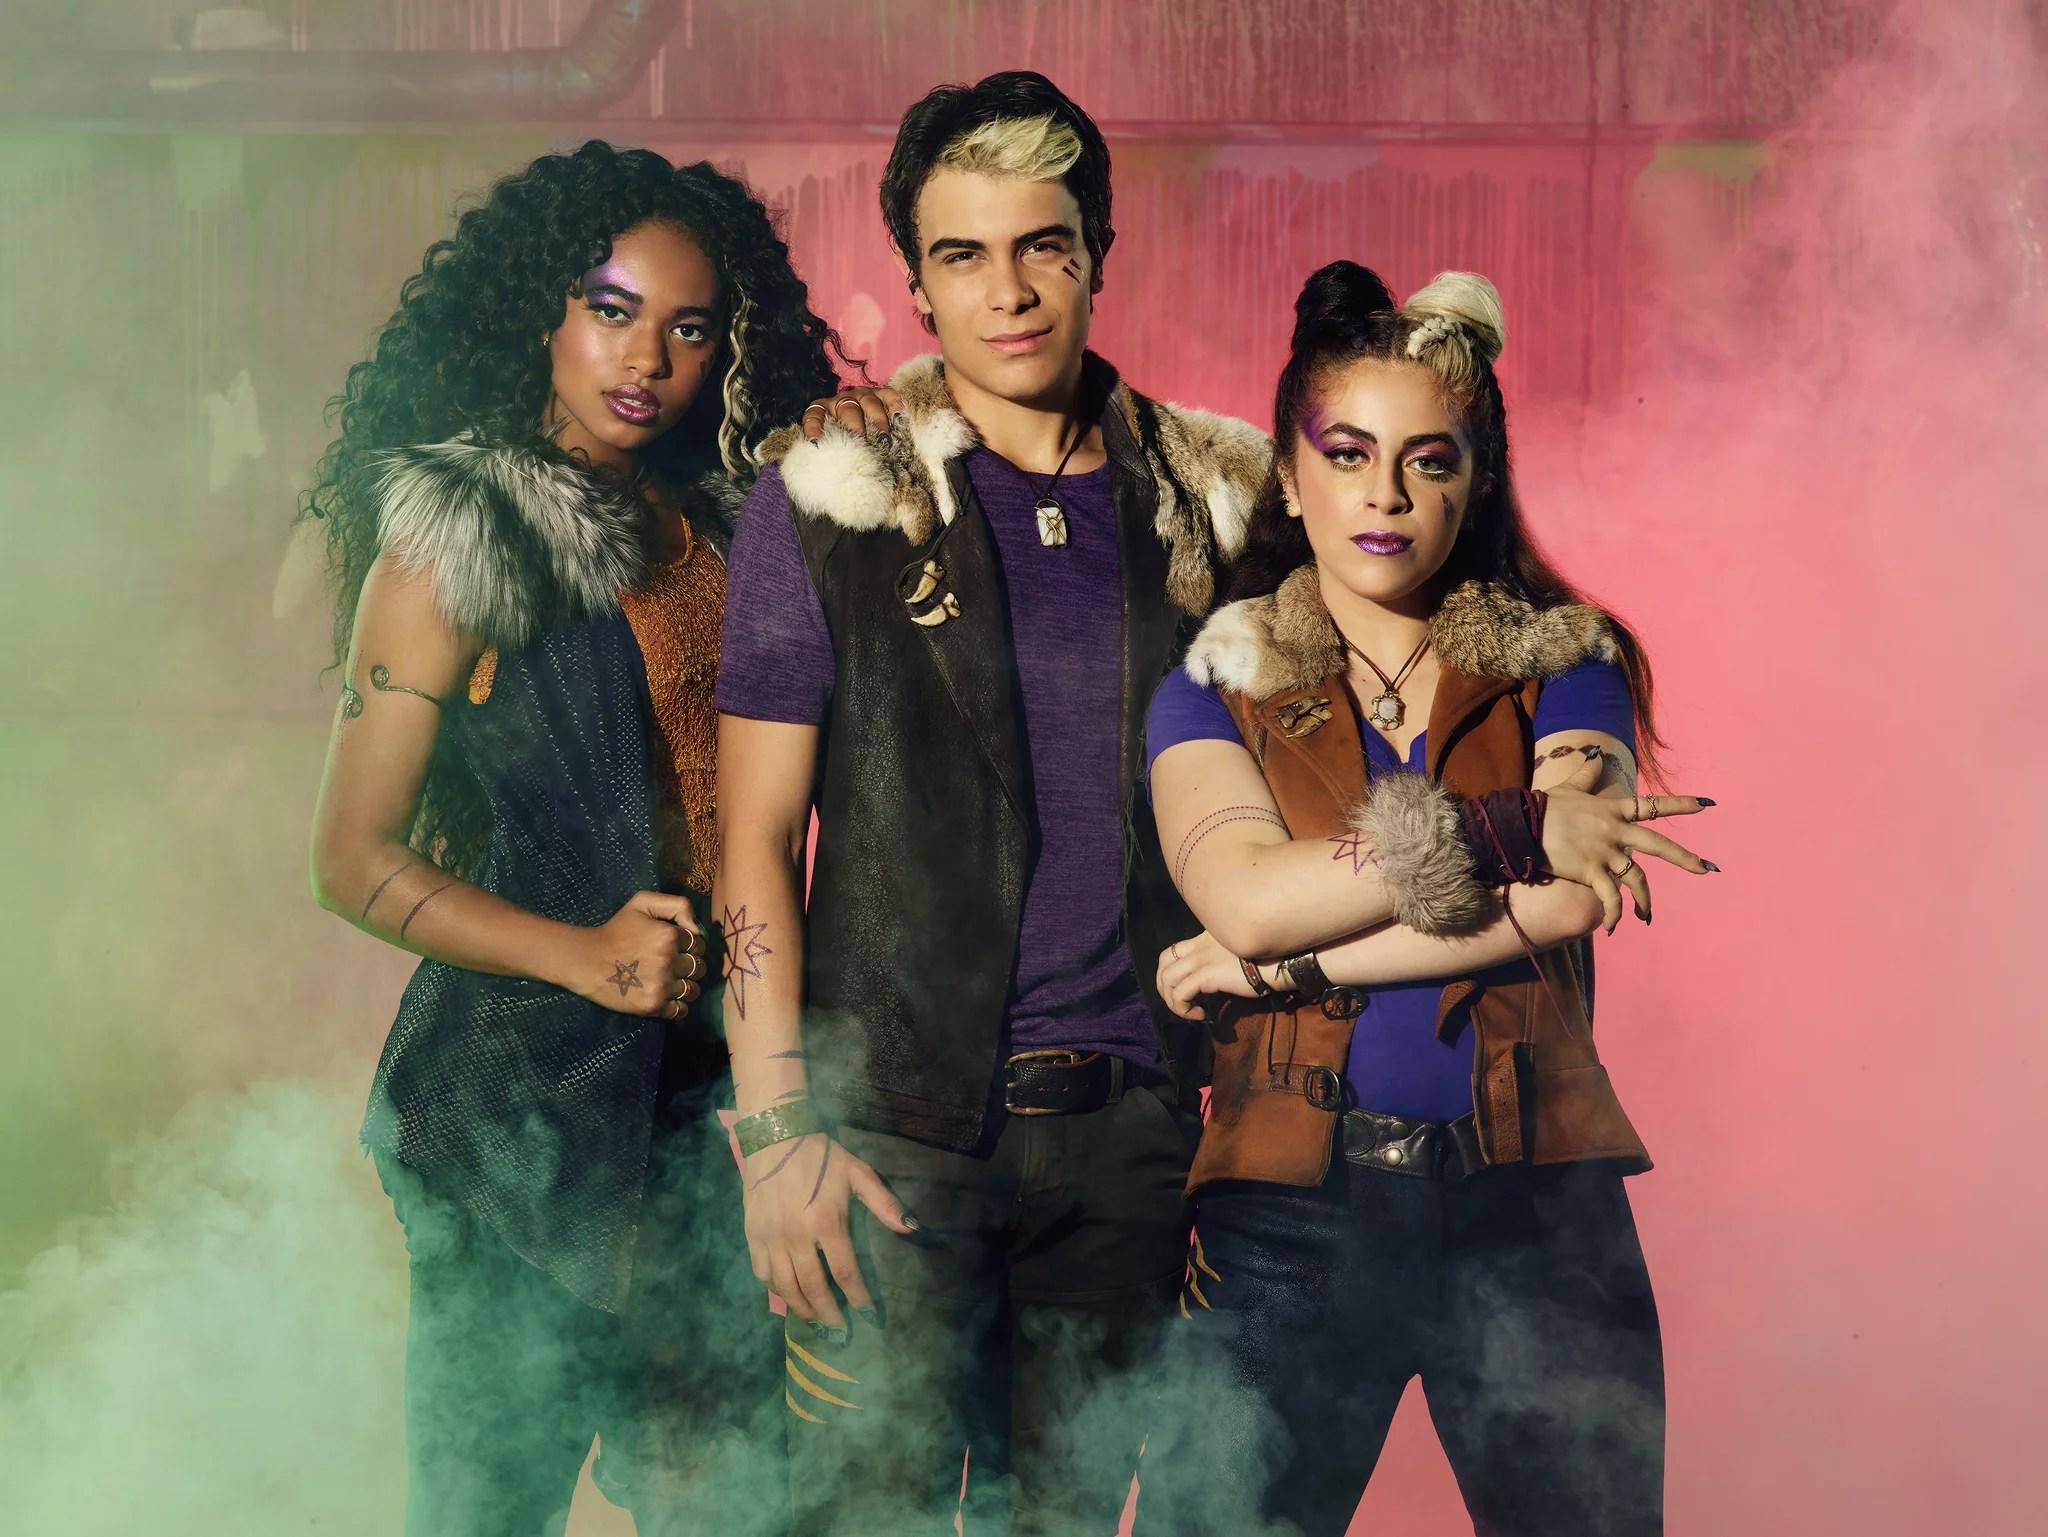 ZOMBIES 2 - Disney Channel's